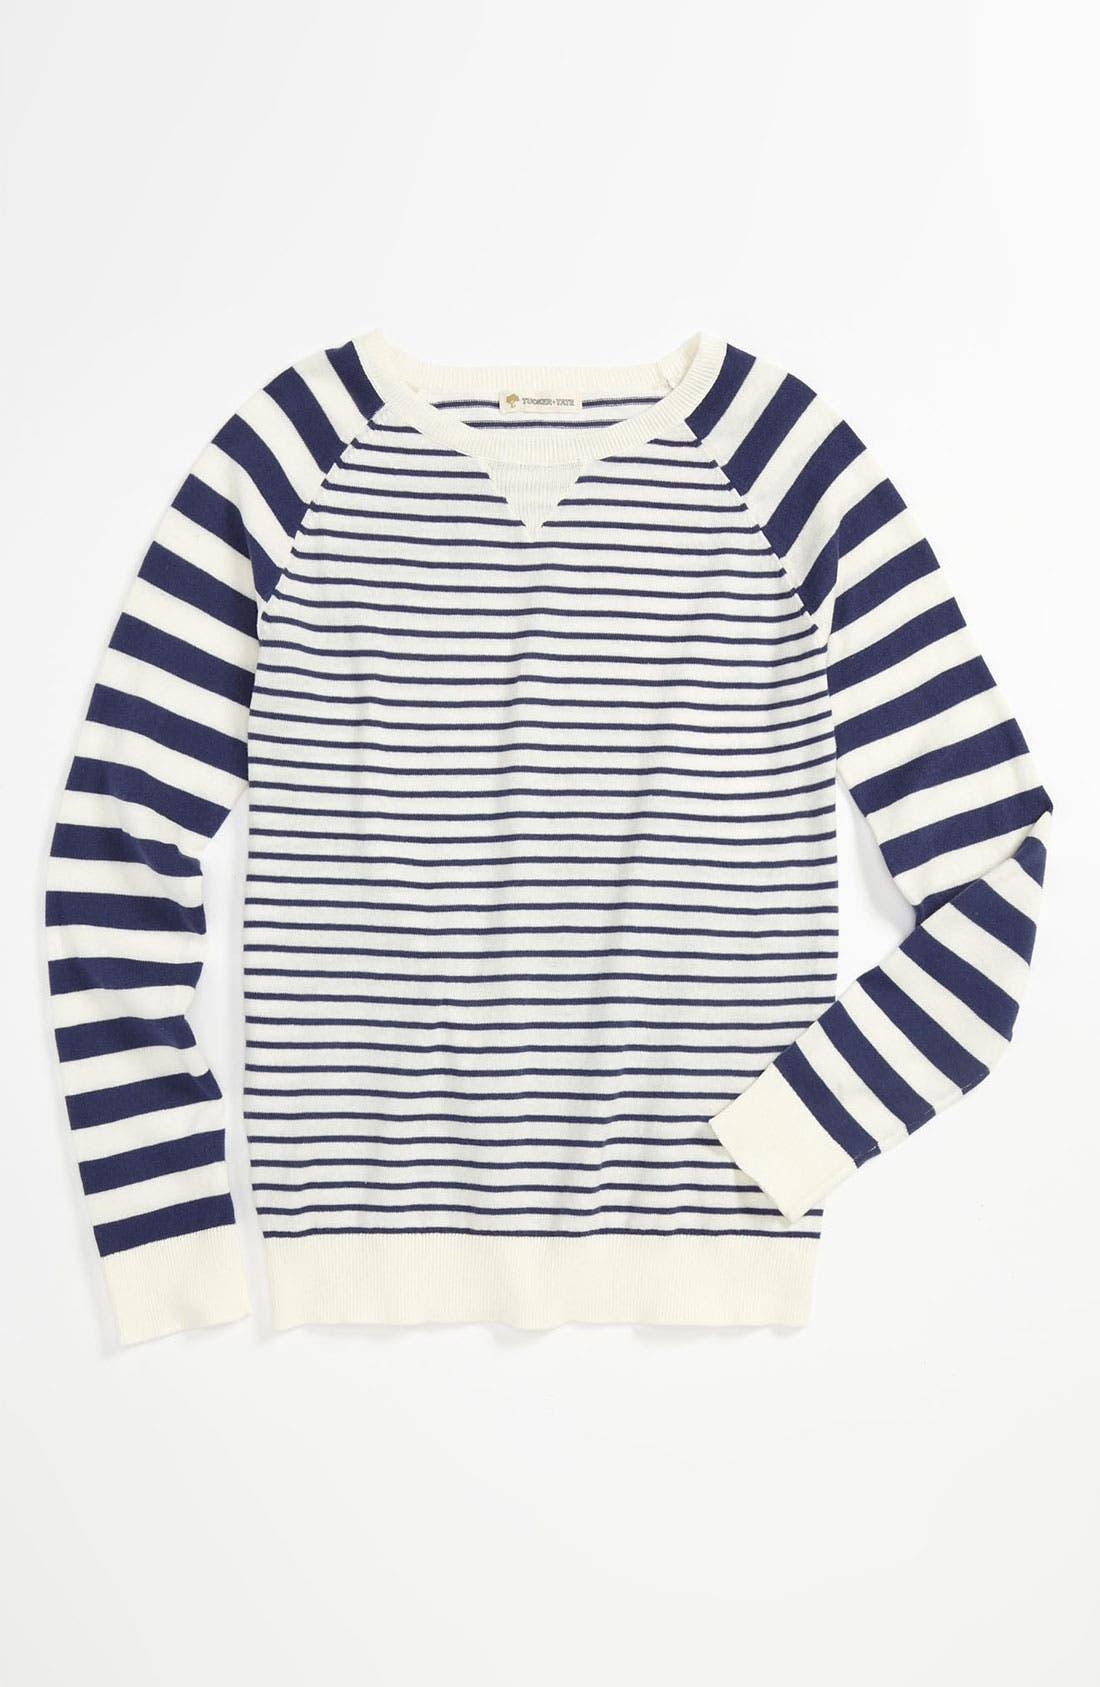 Alternate Image 1 Selected - Tucker + Tate 'Annalise' Stripe Sweater (Big Girls)